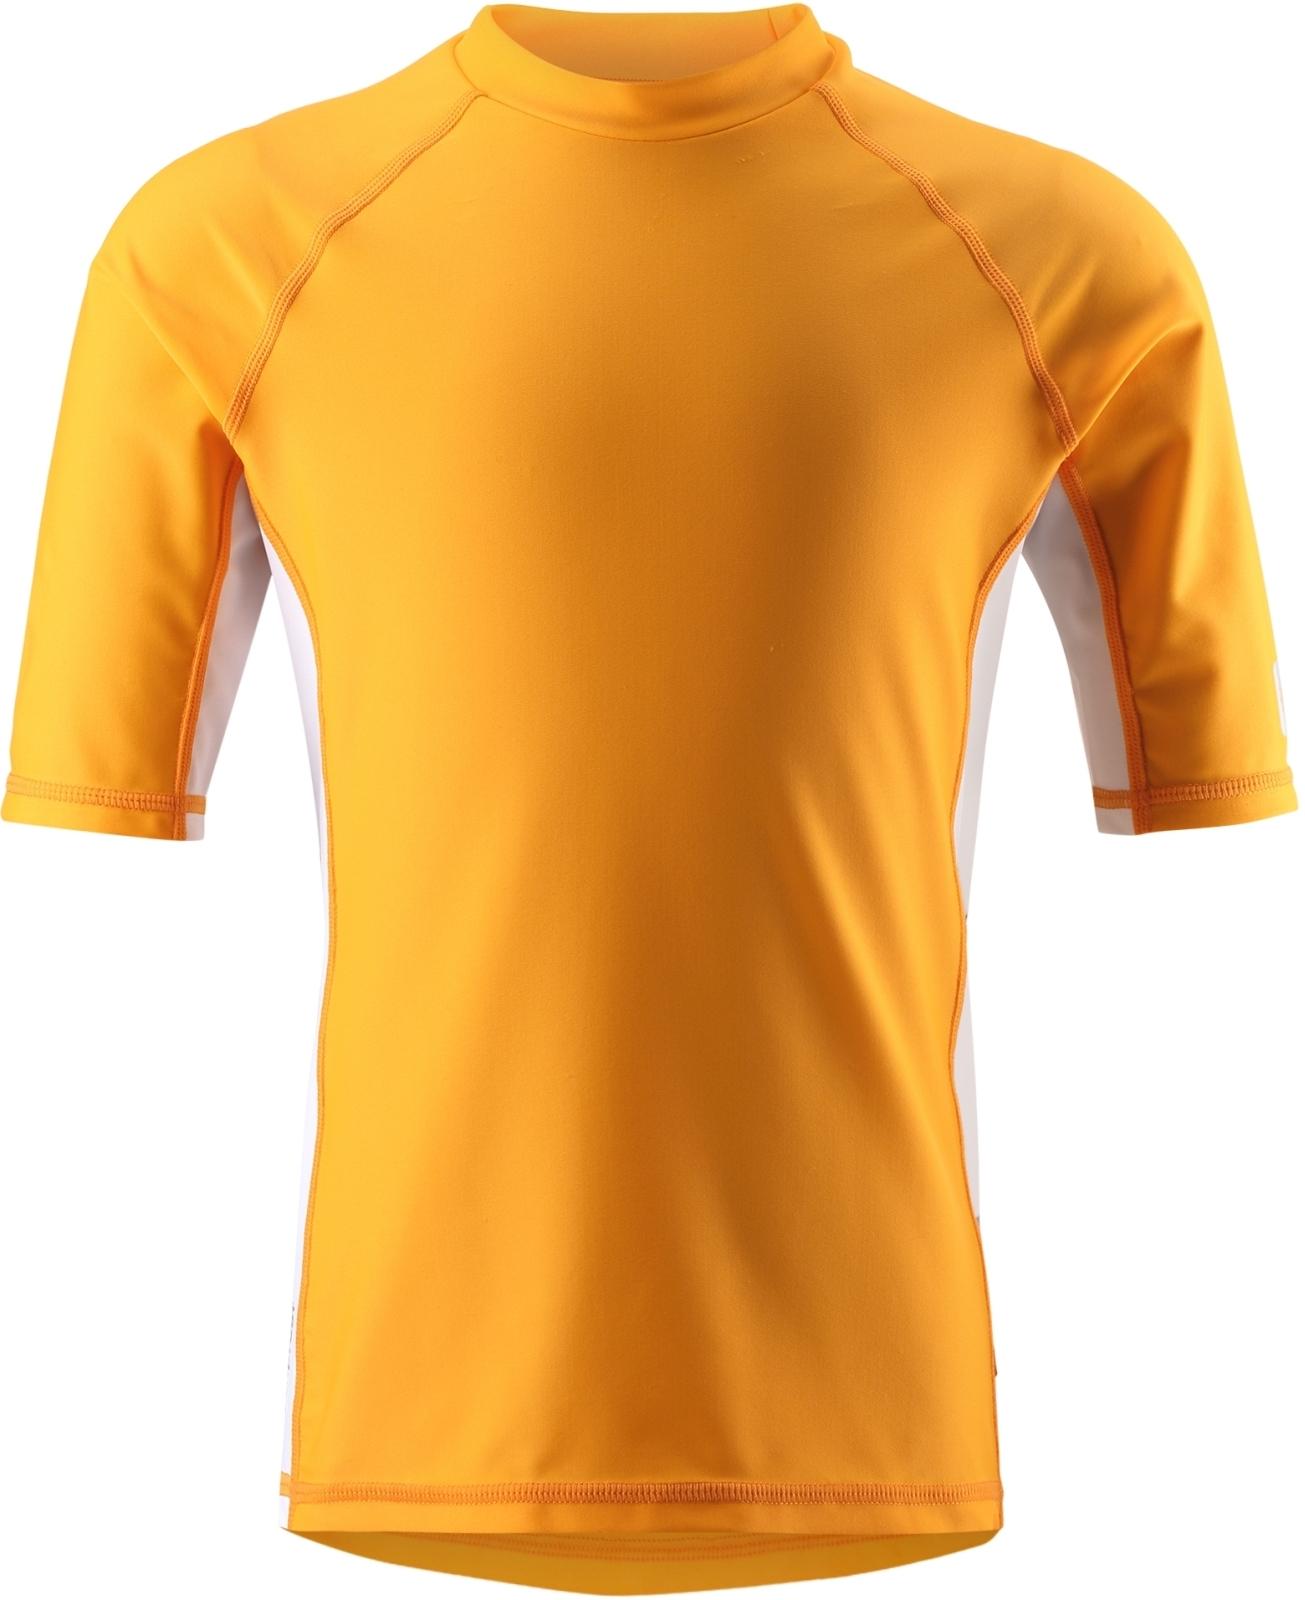 daf328754e8 Dětské UV triko s krátkým rukávem Reima Fiji - mango - Skibi Kids